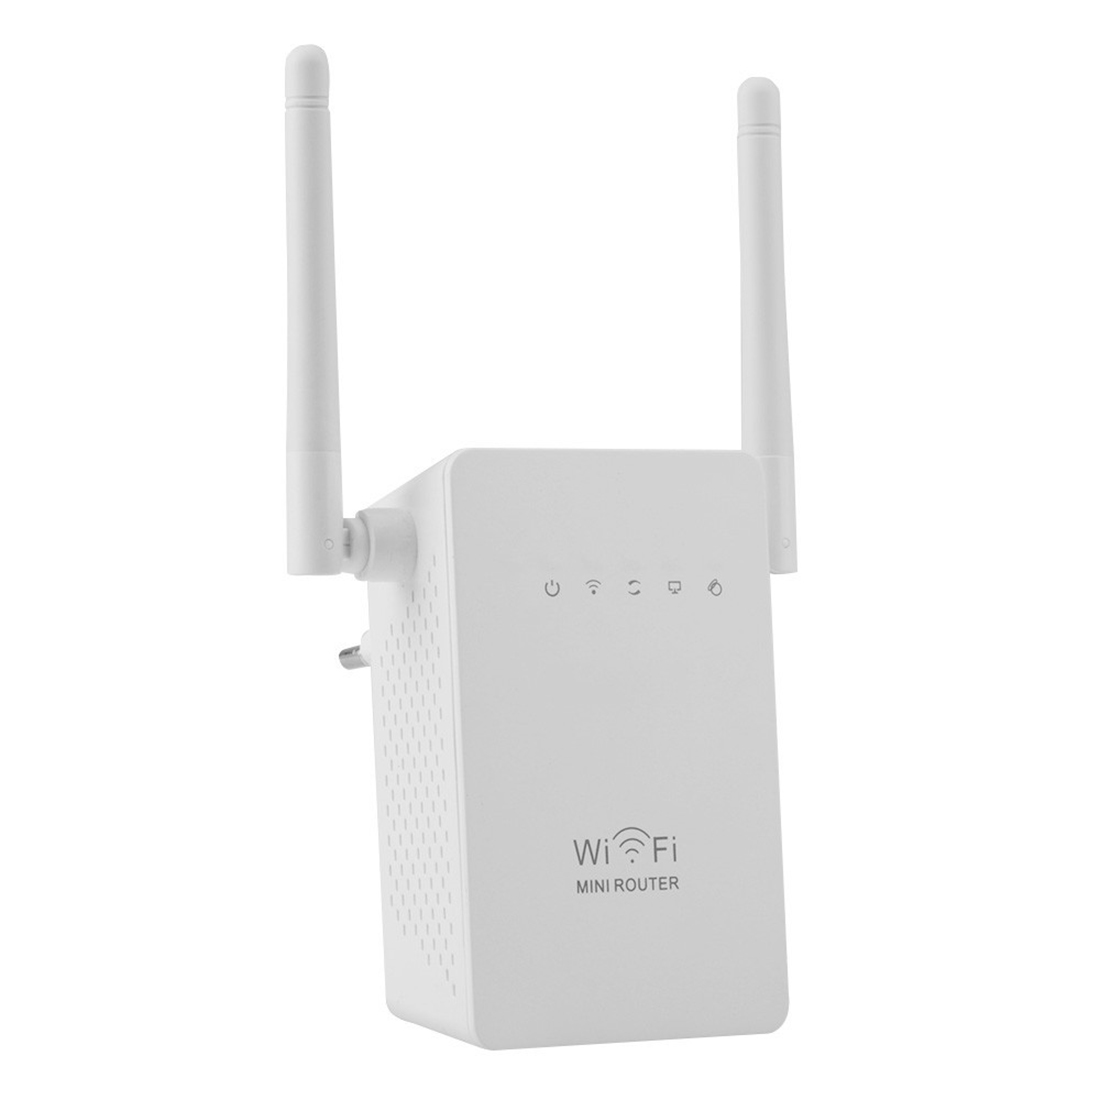 300Mbps WiFi Repeater Network Range Extender Booster N300 Single Increase Dual External Antennas EU US Plug